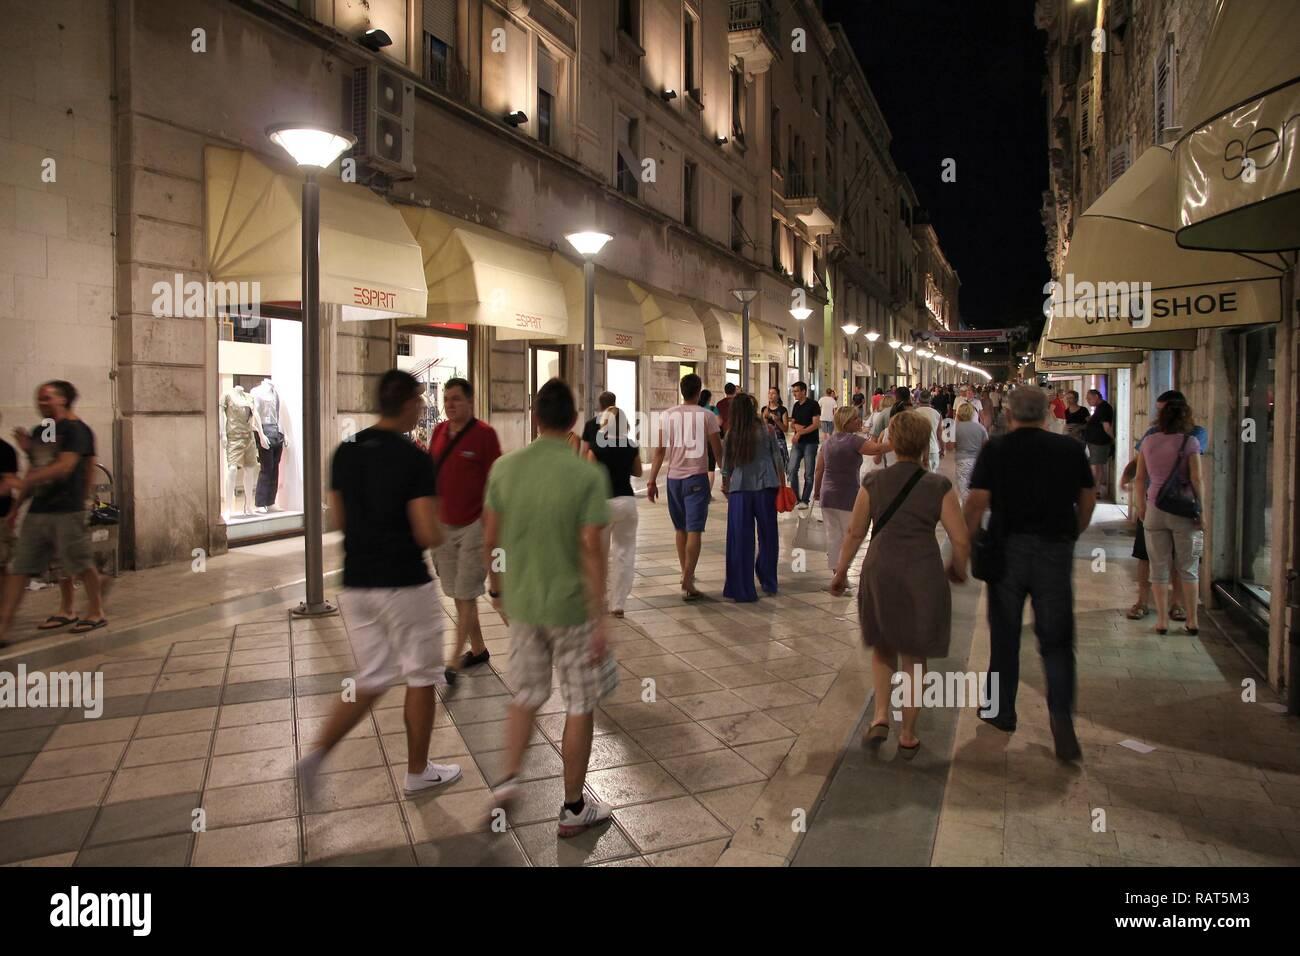 SPLIT, CROATIA - JUNE 27: People walk the old town street in the night on June 27, 2011 in Split, Croatia. In 2011 11.2 million tourists visited Croat - Stock Image